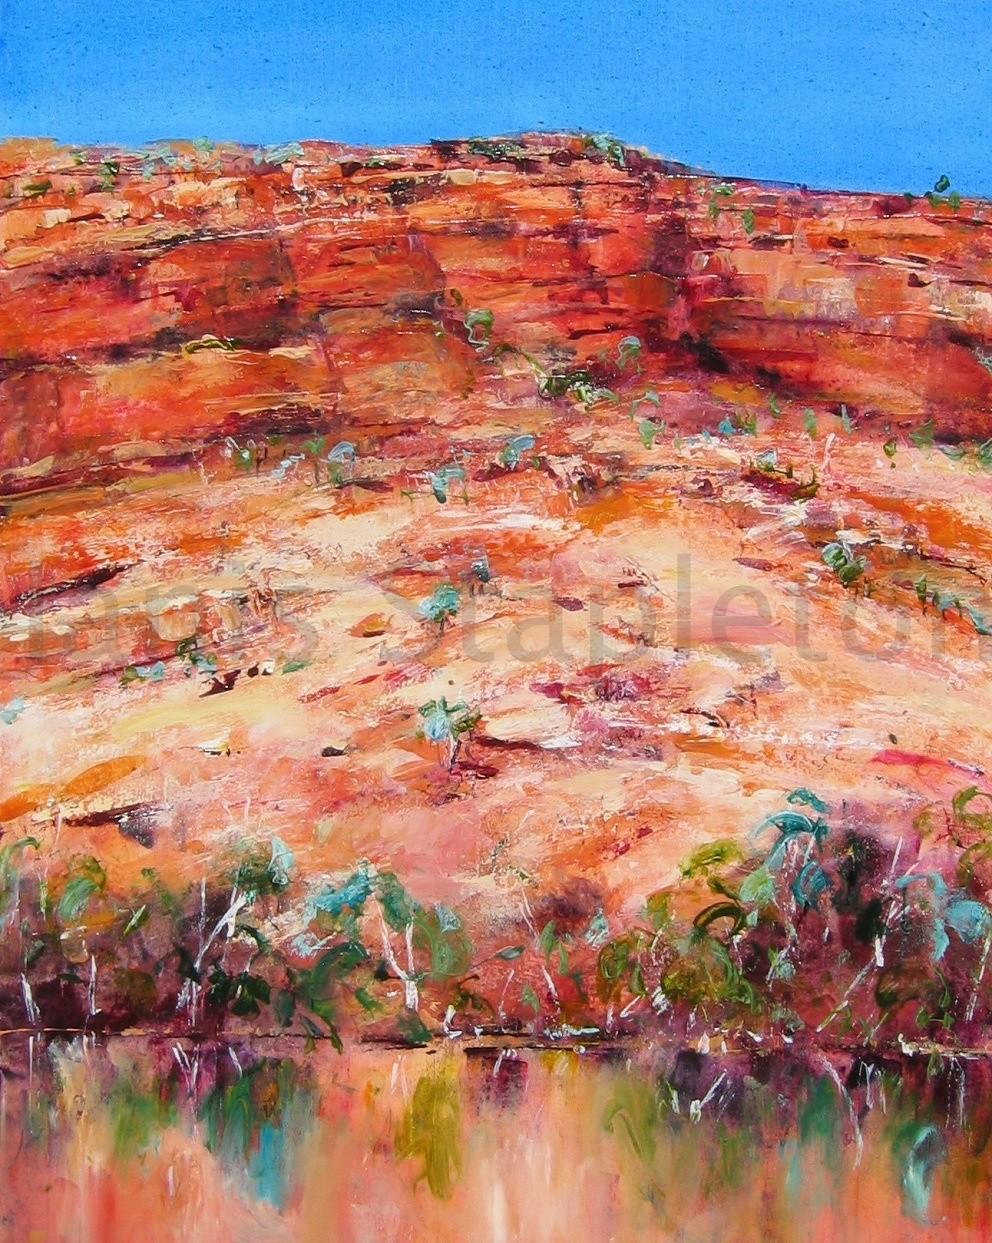 Kimberley Escarpment